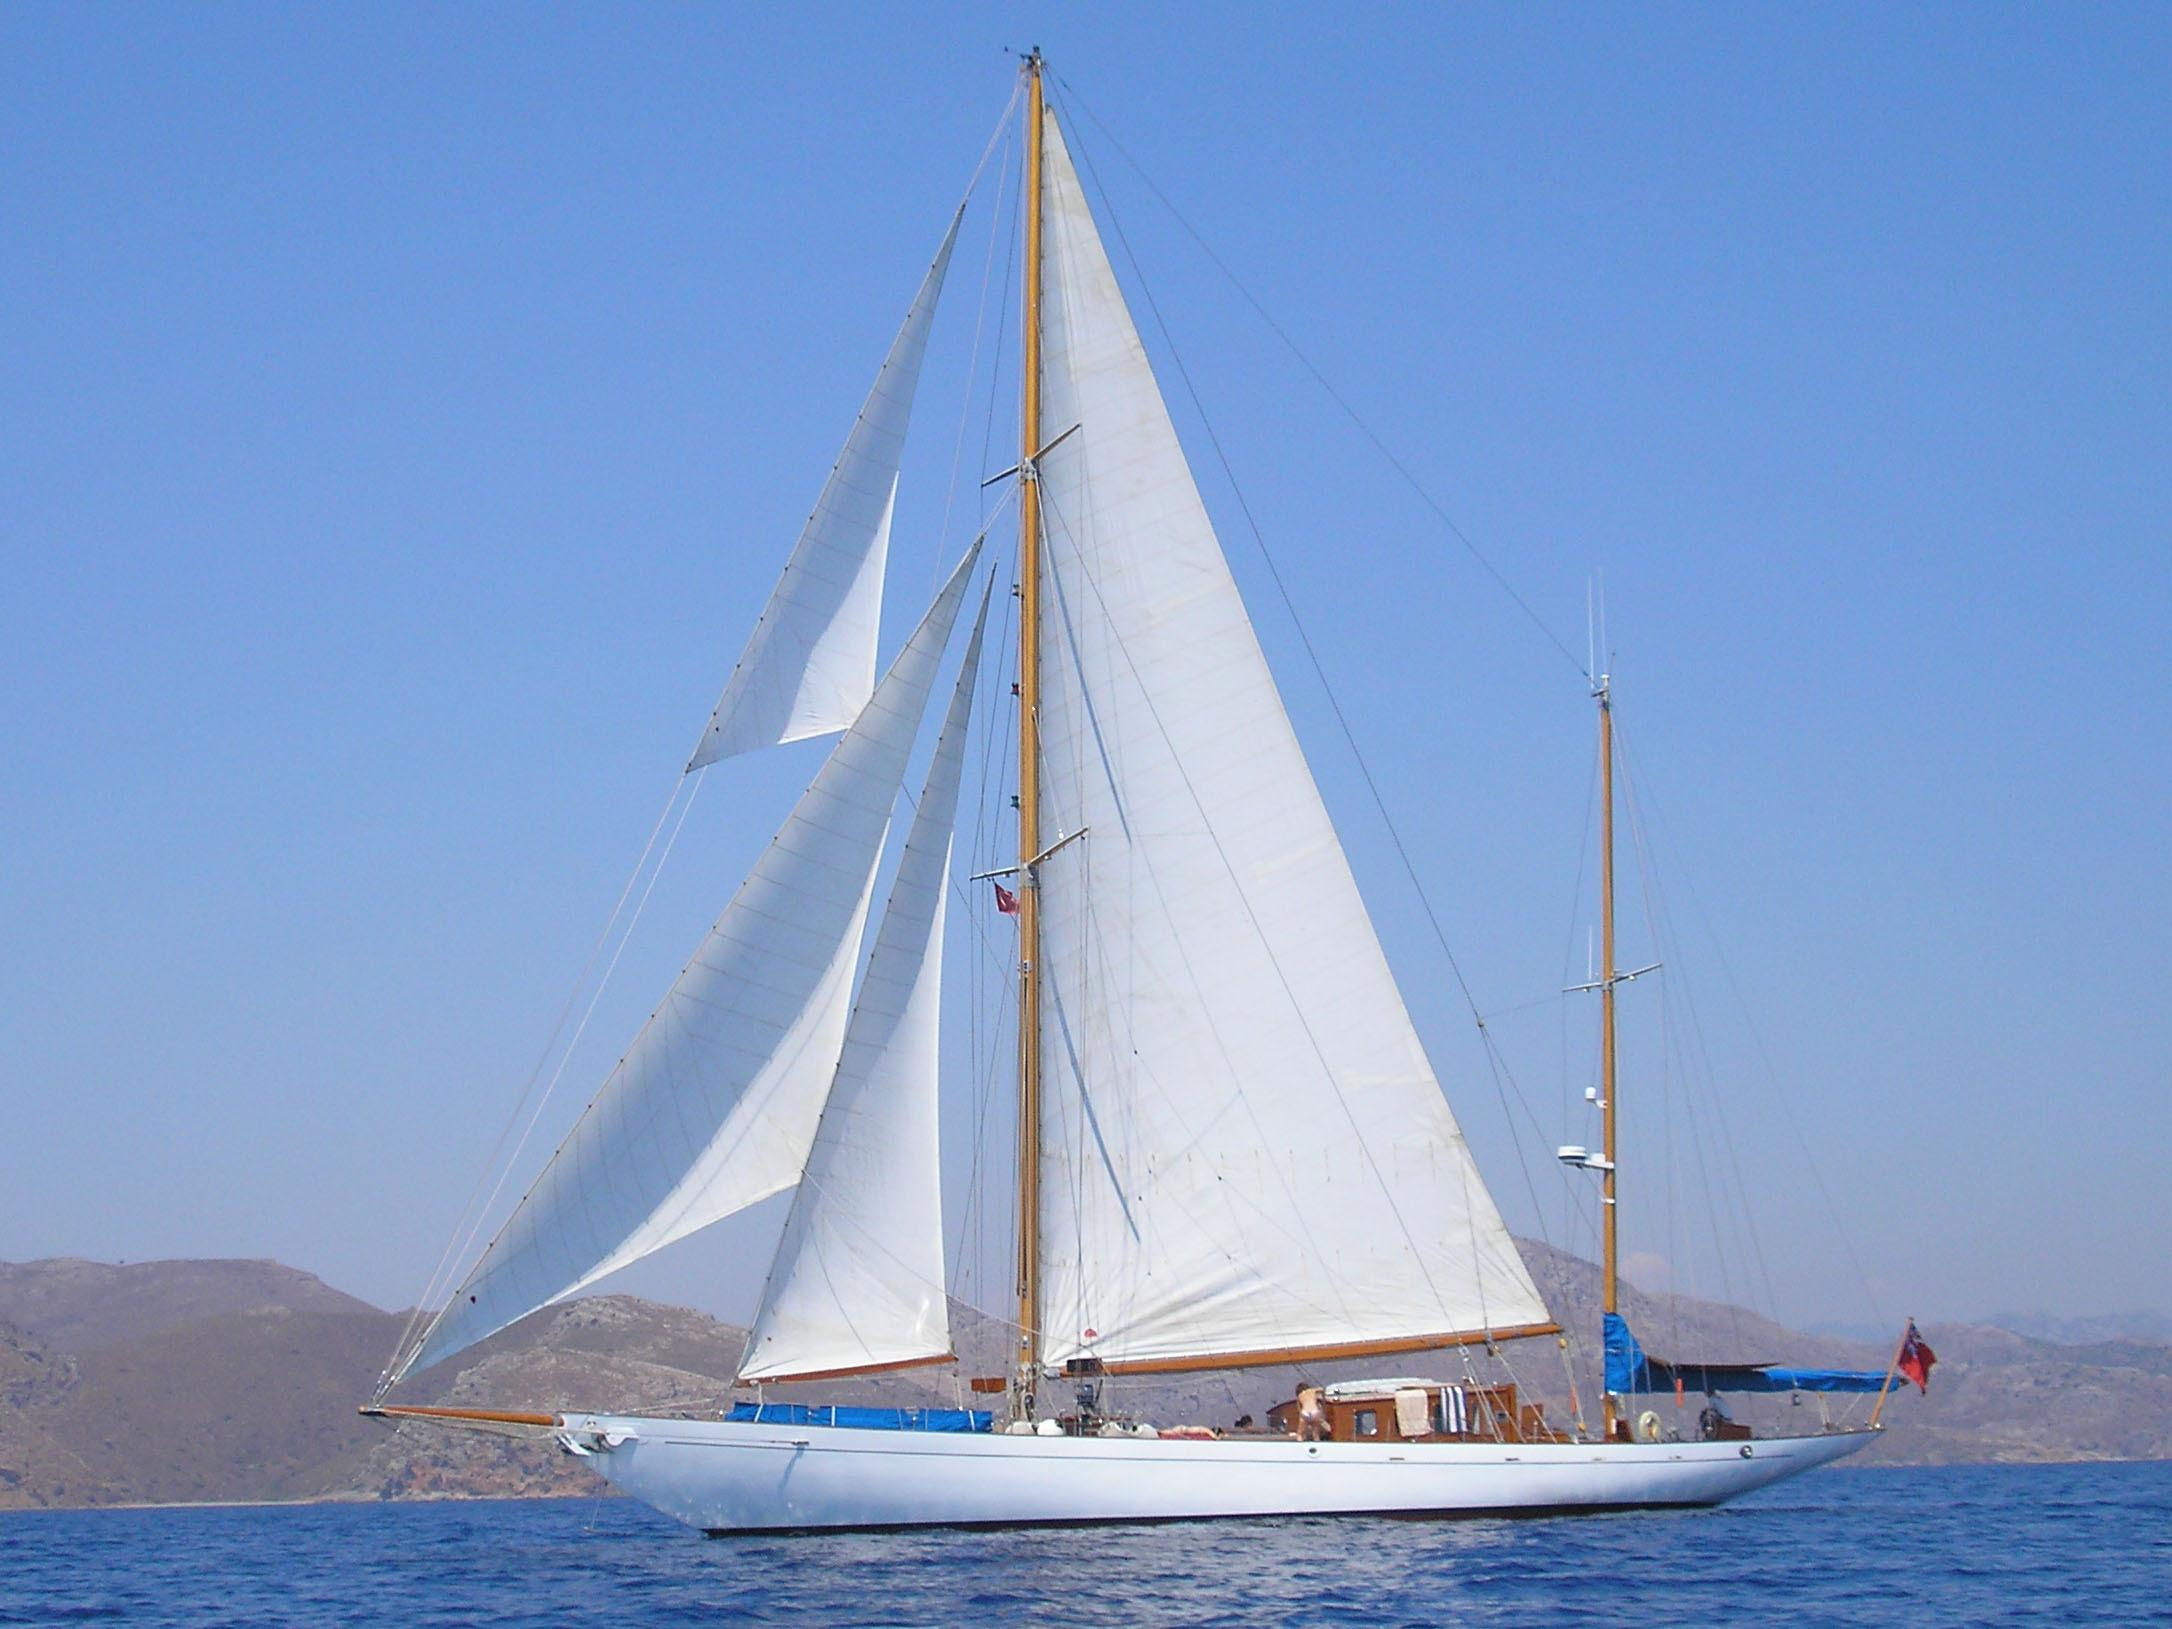 1933 Camper Amp Nicholsons Classic 114FT Ketch Sail Boat For